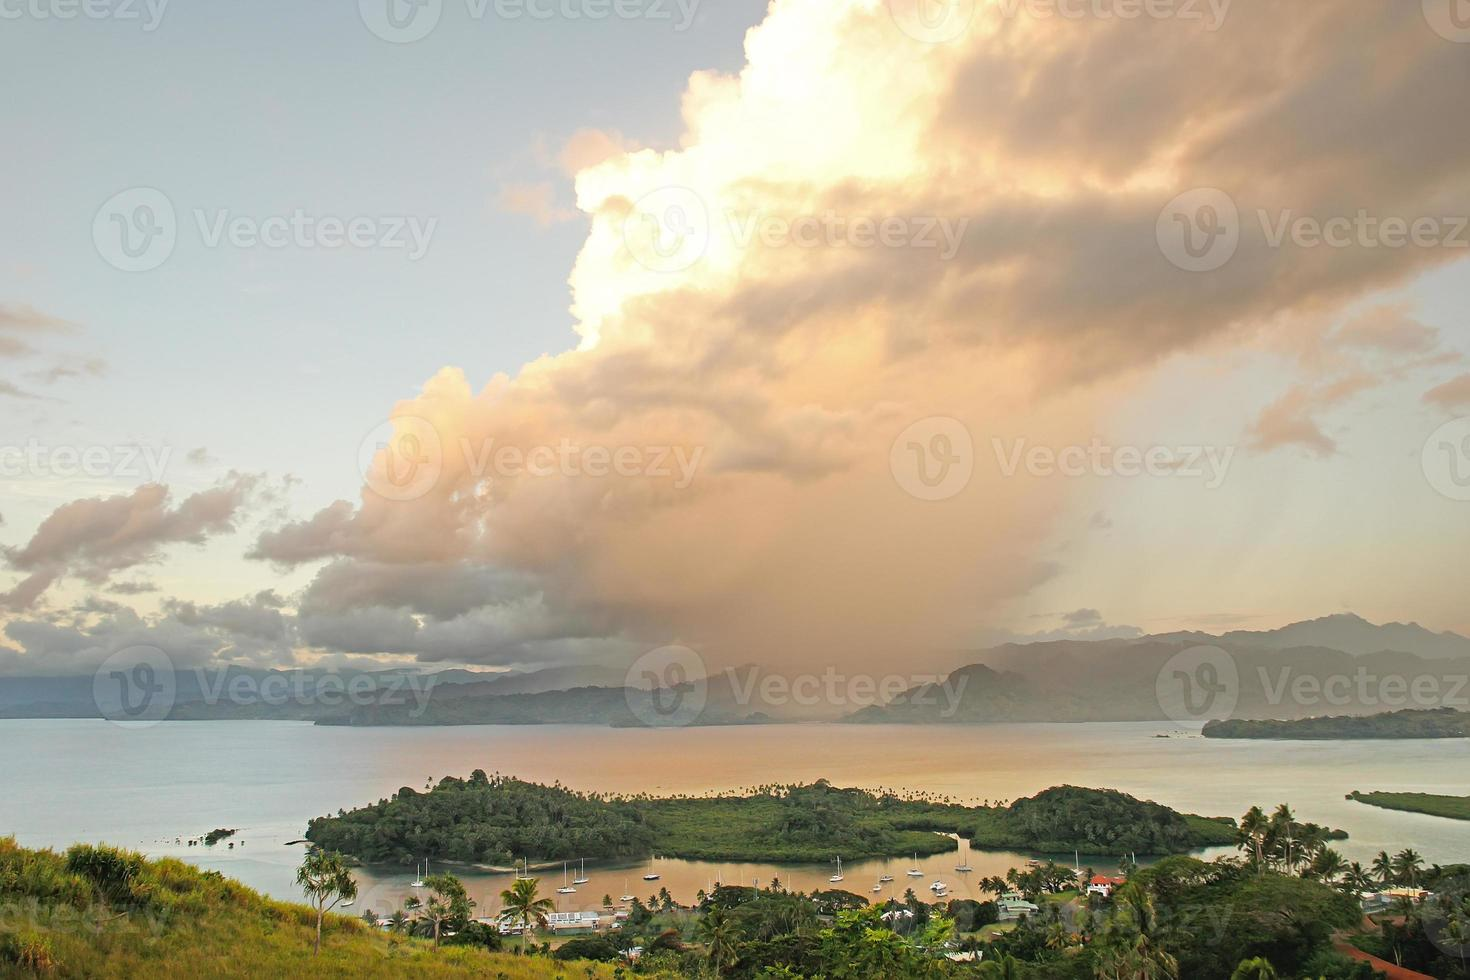 marina de savusavu e ilhota de nawi, ilha de vanua levu, fiji foto